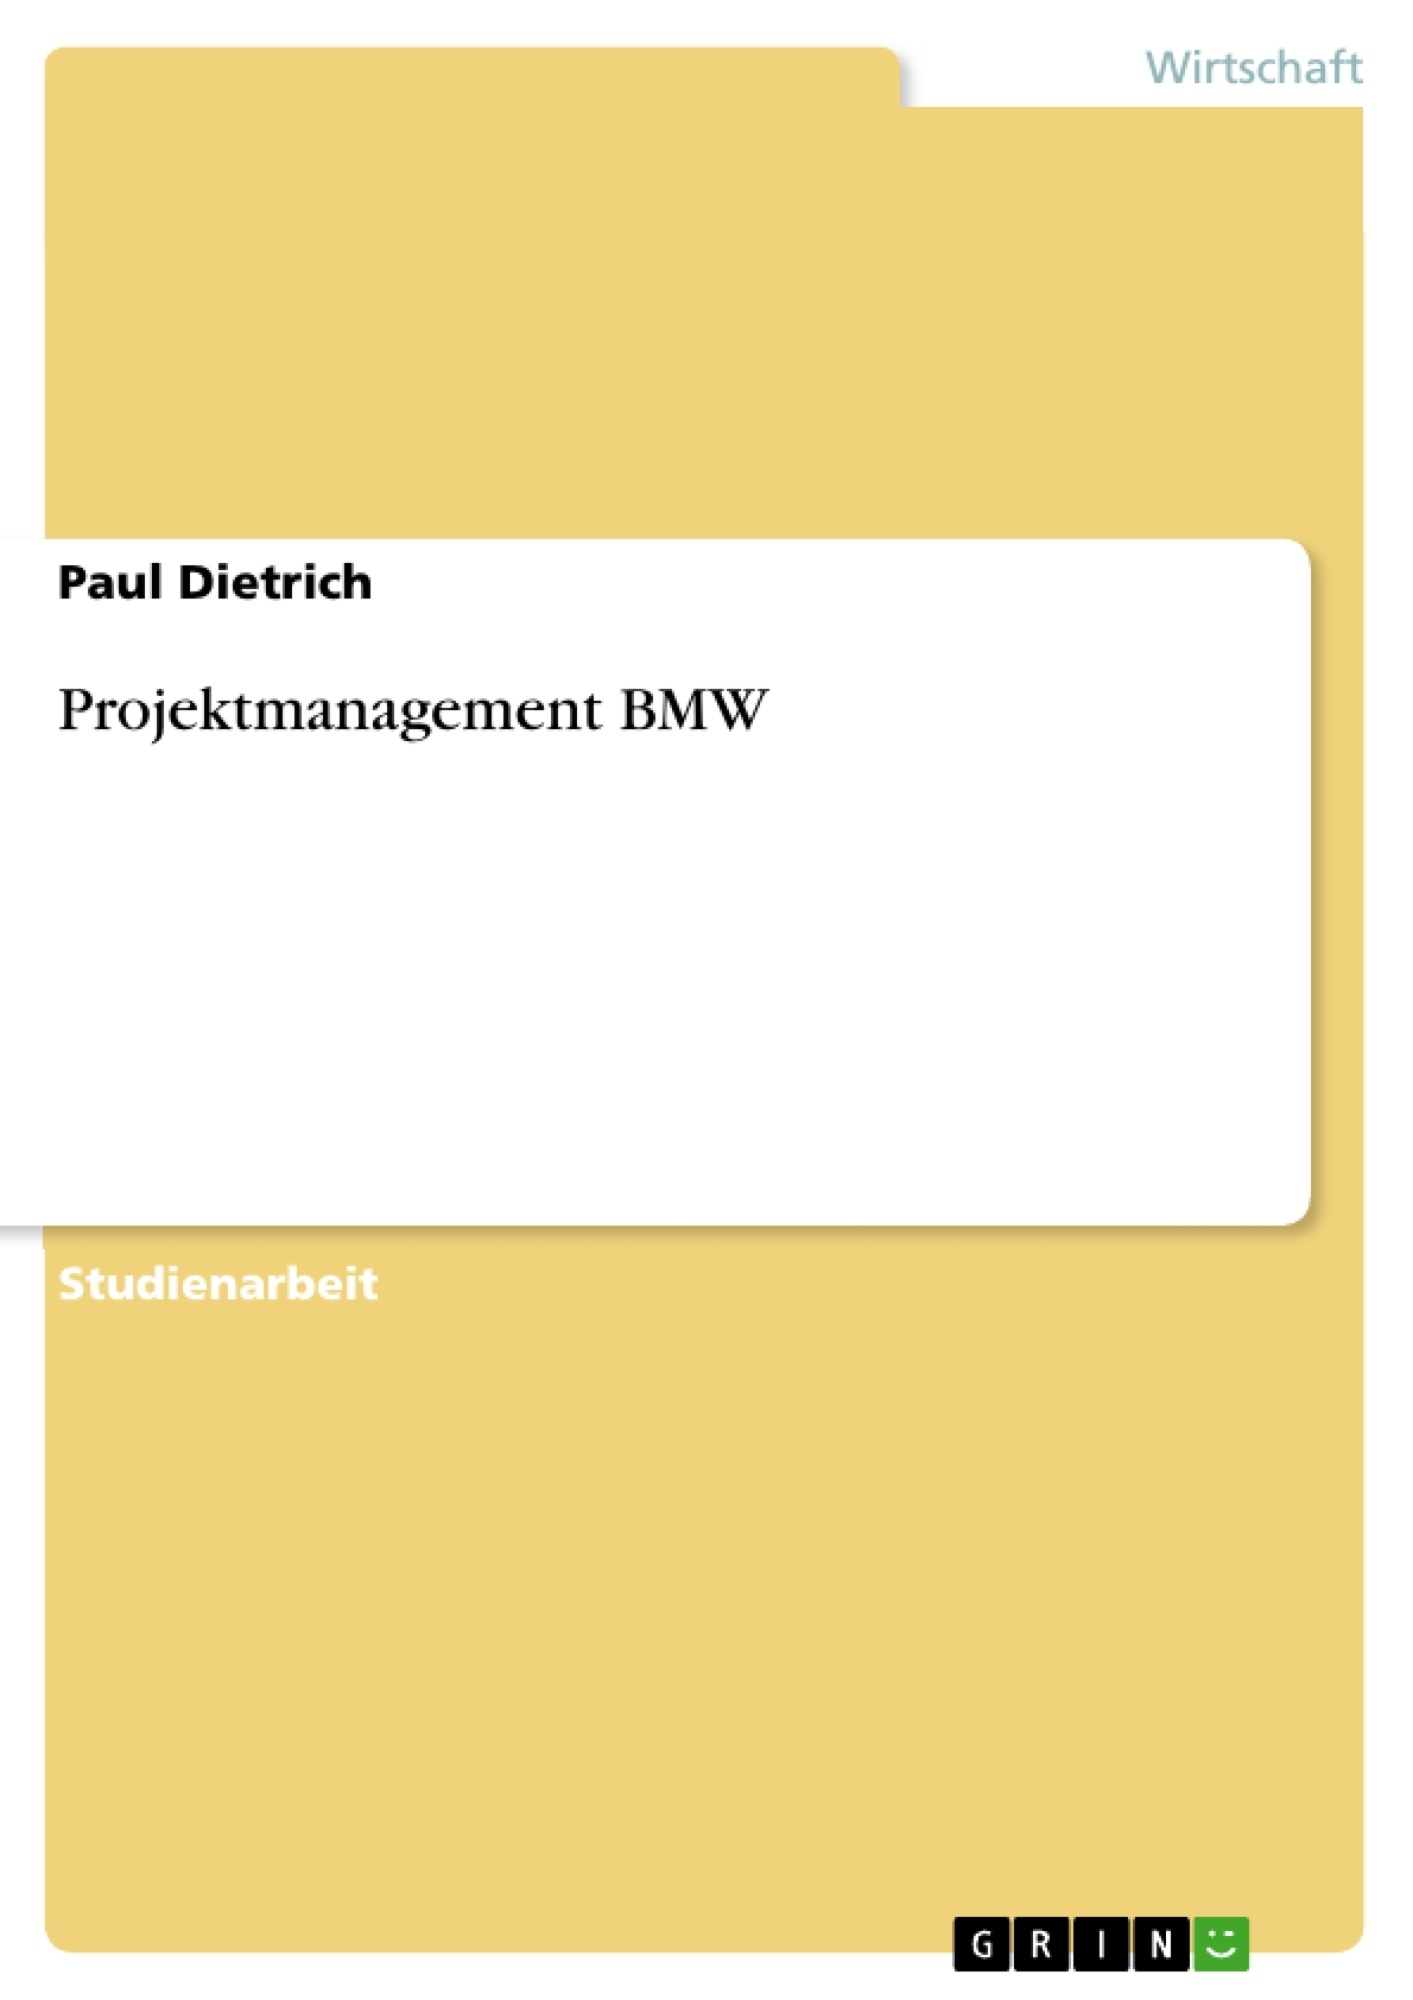 Titel: Projektmanagement BMW